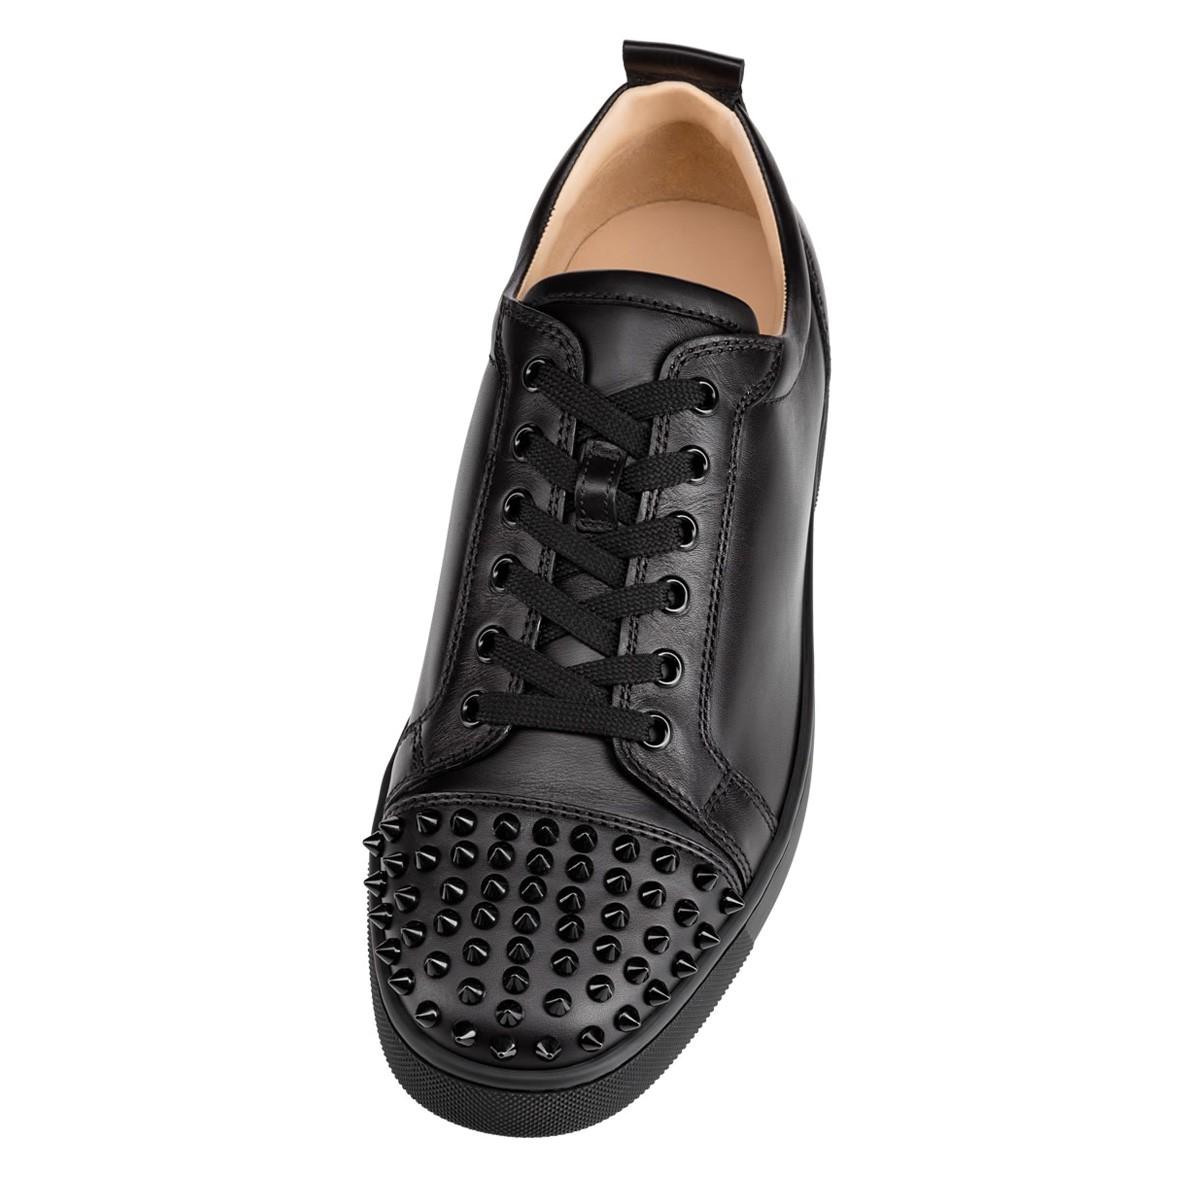 Shoes - Louis Junior Spikes Flat - Christian Louboutin